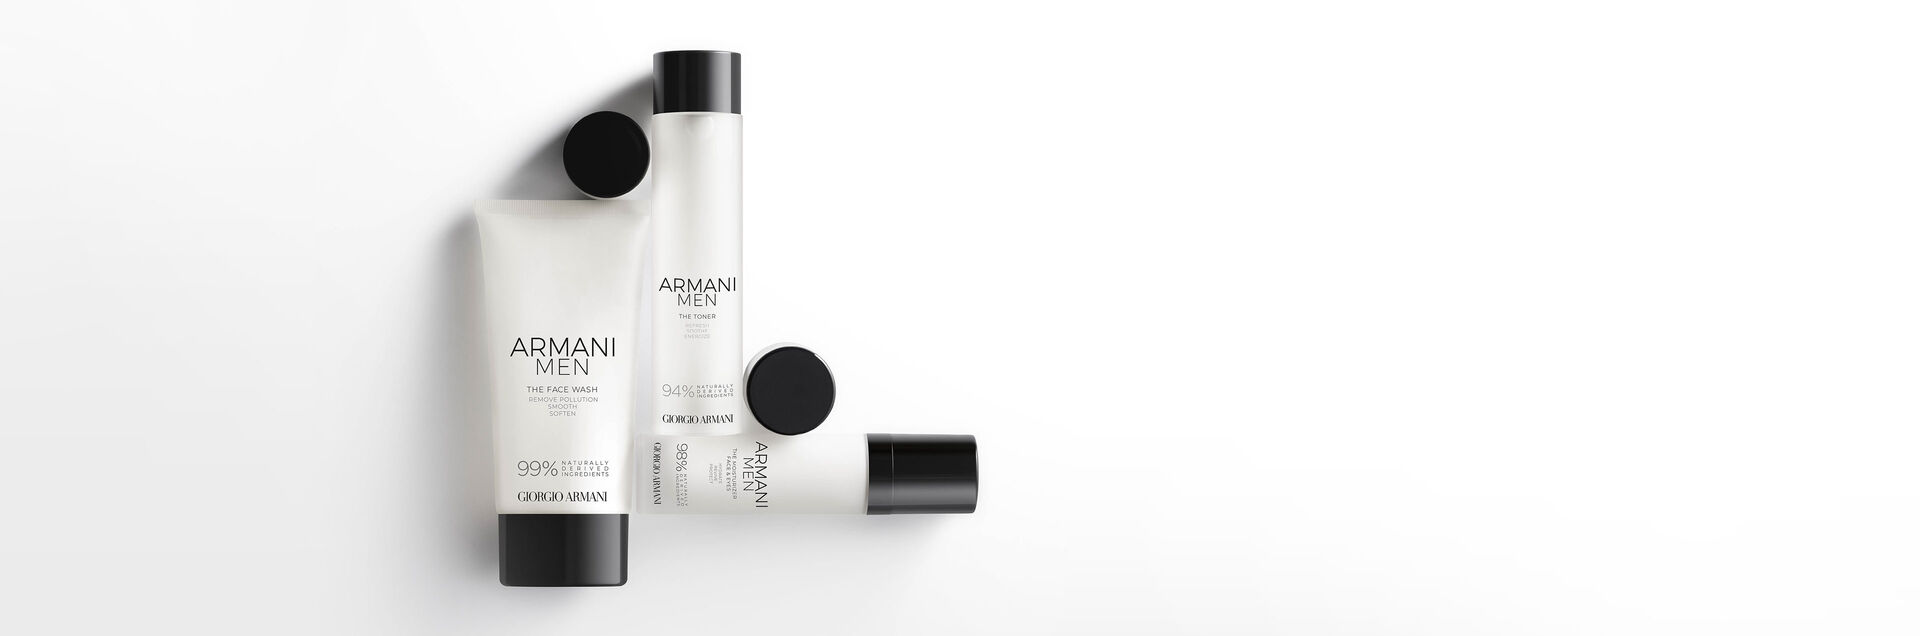 fb7113d25 Fragrances, Makeup, Skincare & Gifts | Giorgio Armani Beauty